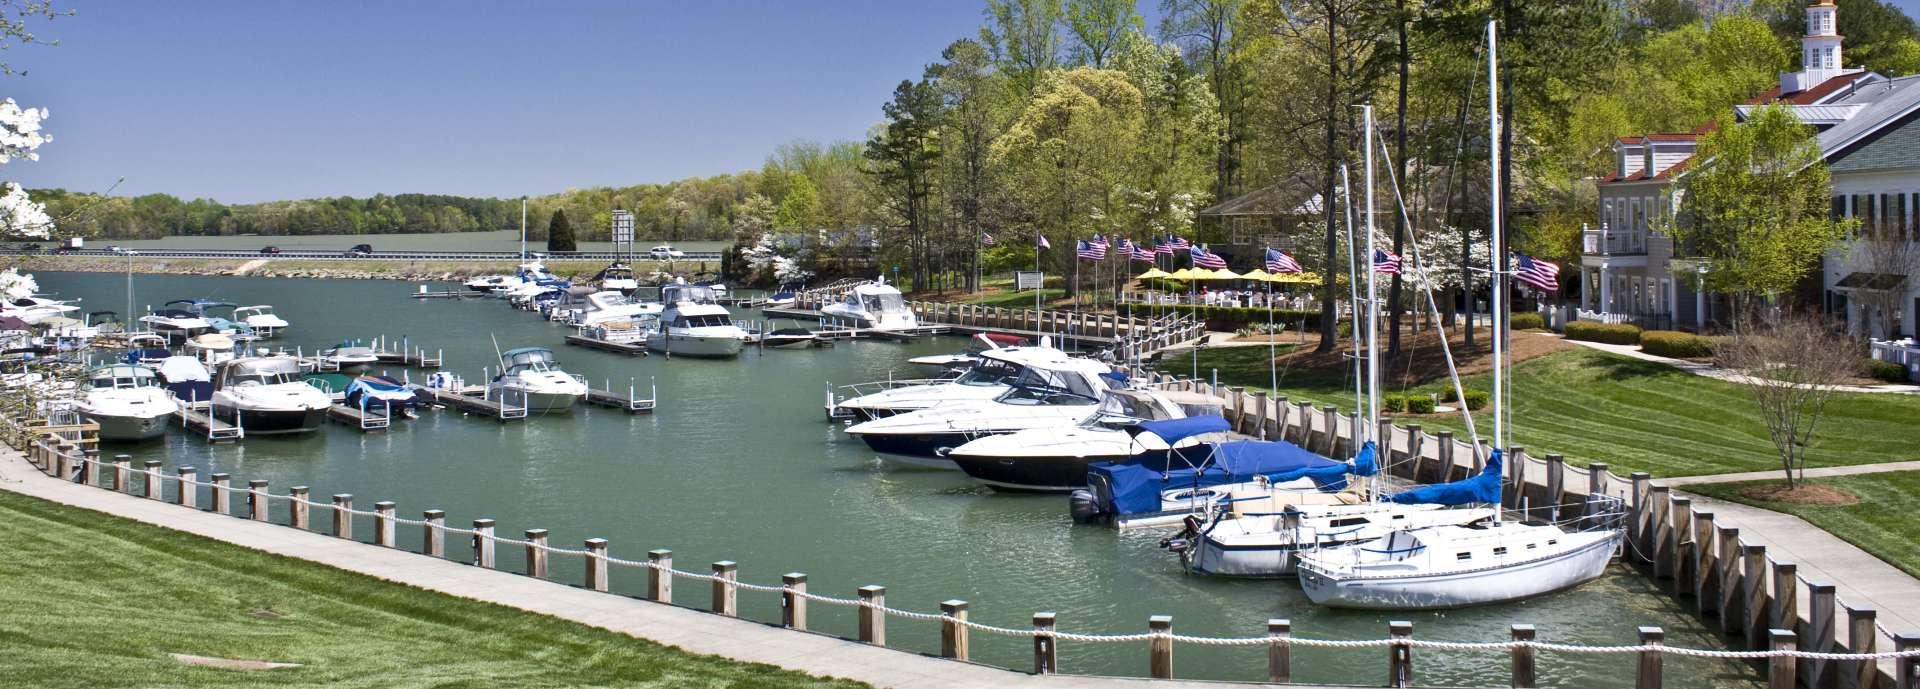 Lake Norman Boating & Marinas | Boat Access & Launches